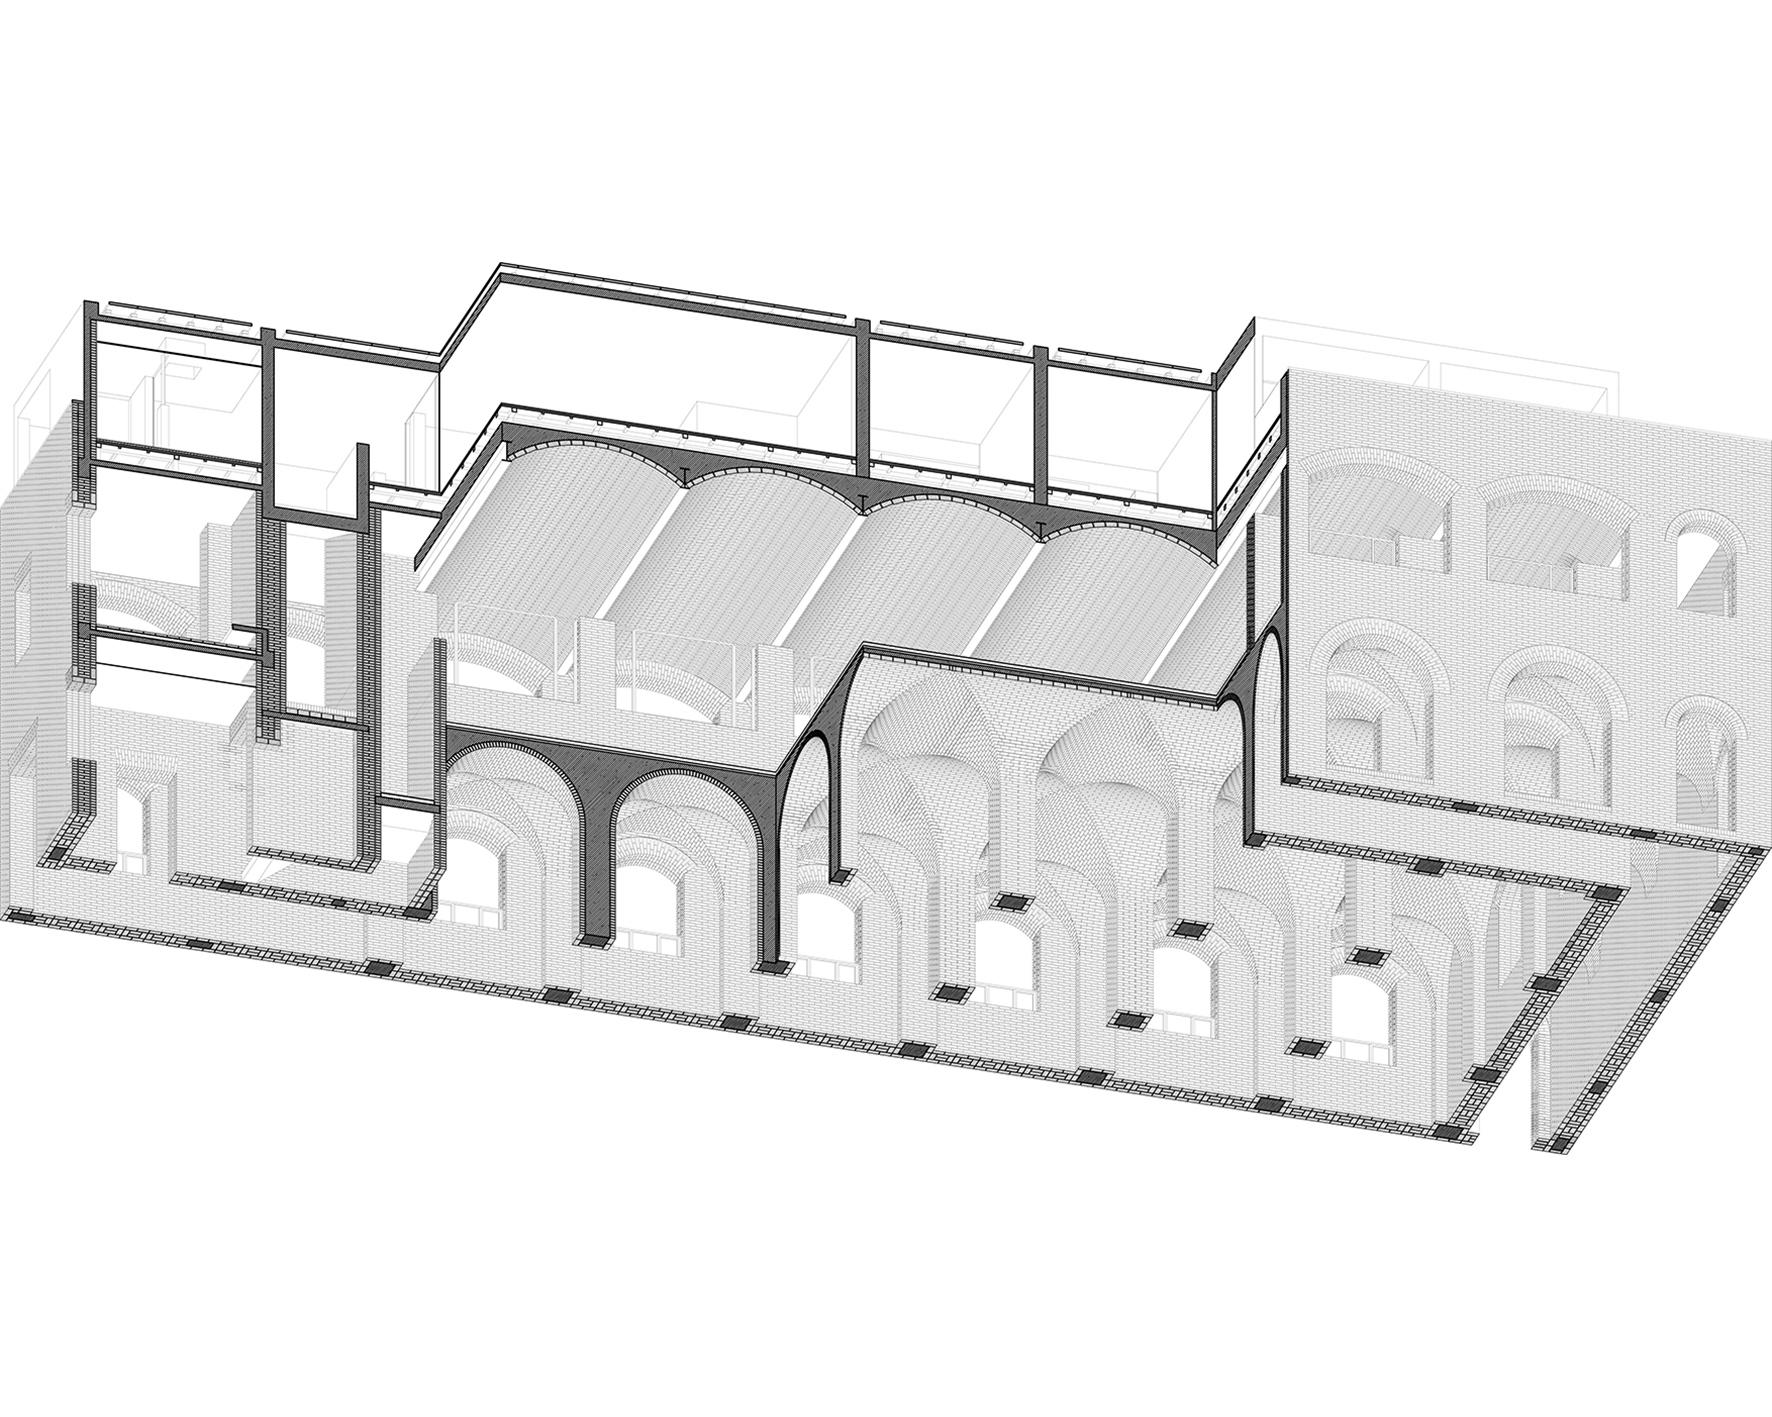 主體建筑剖軸側  Sectional-axonof the main building.jpg